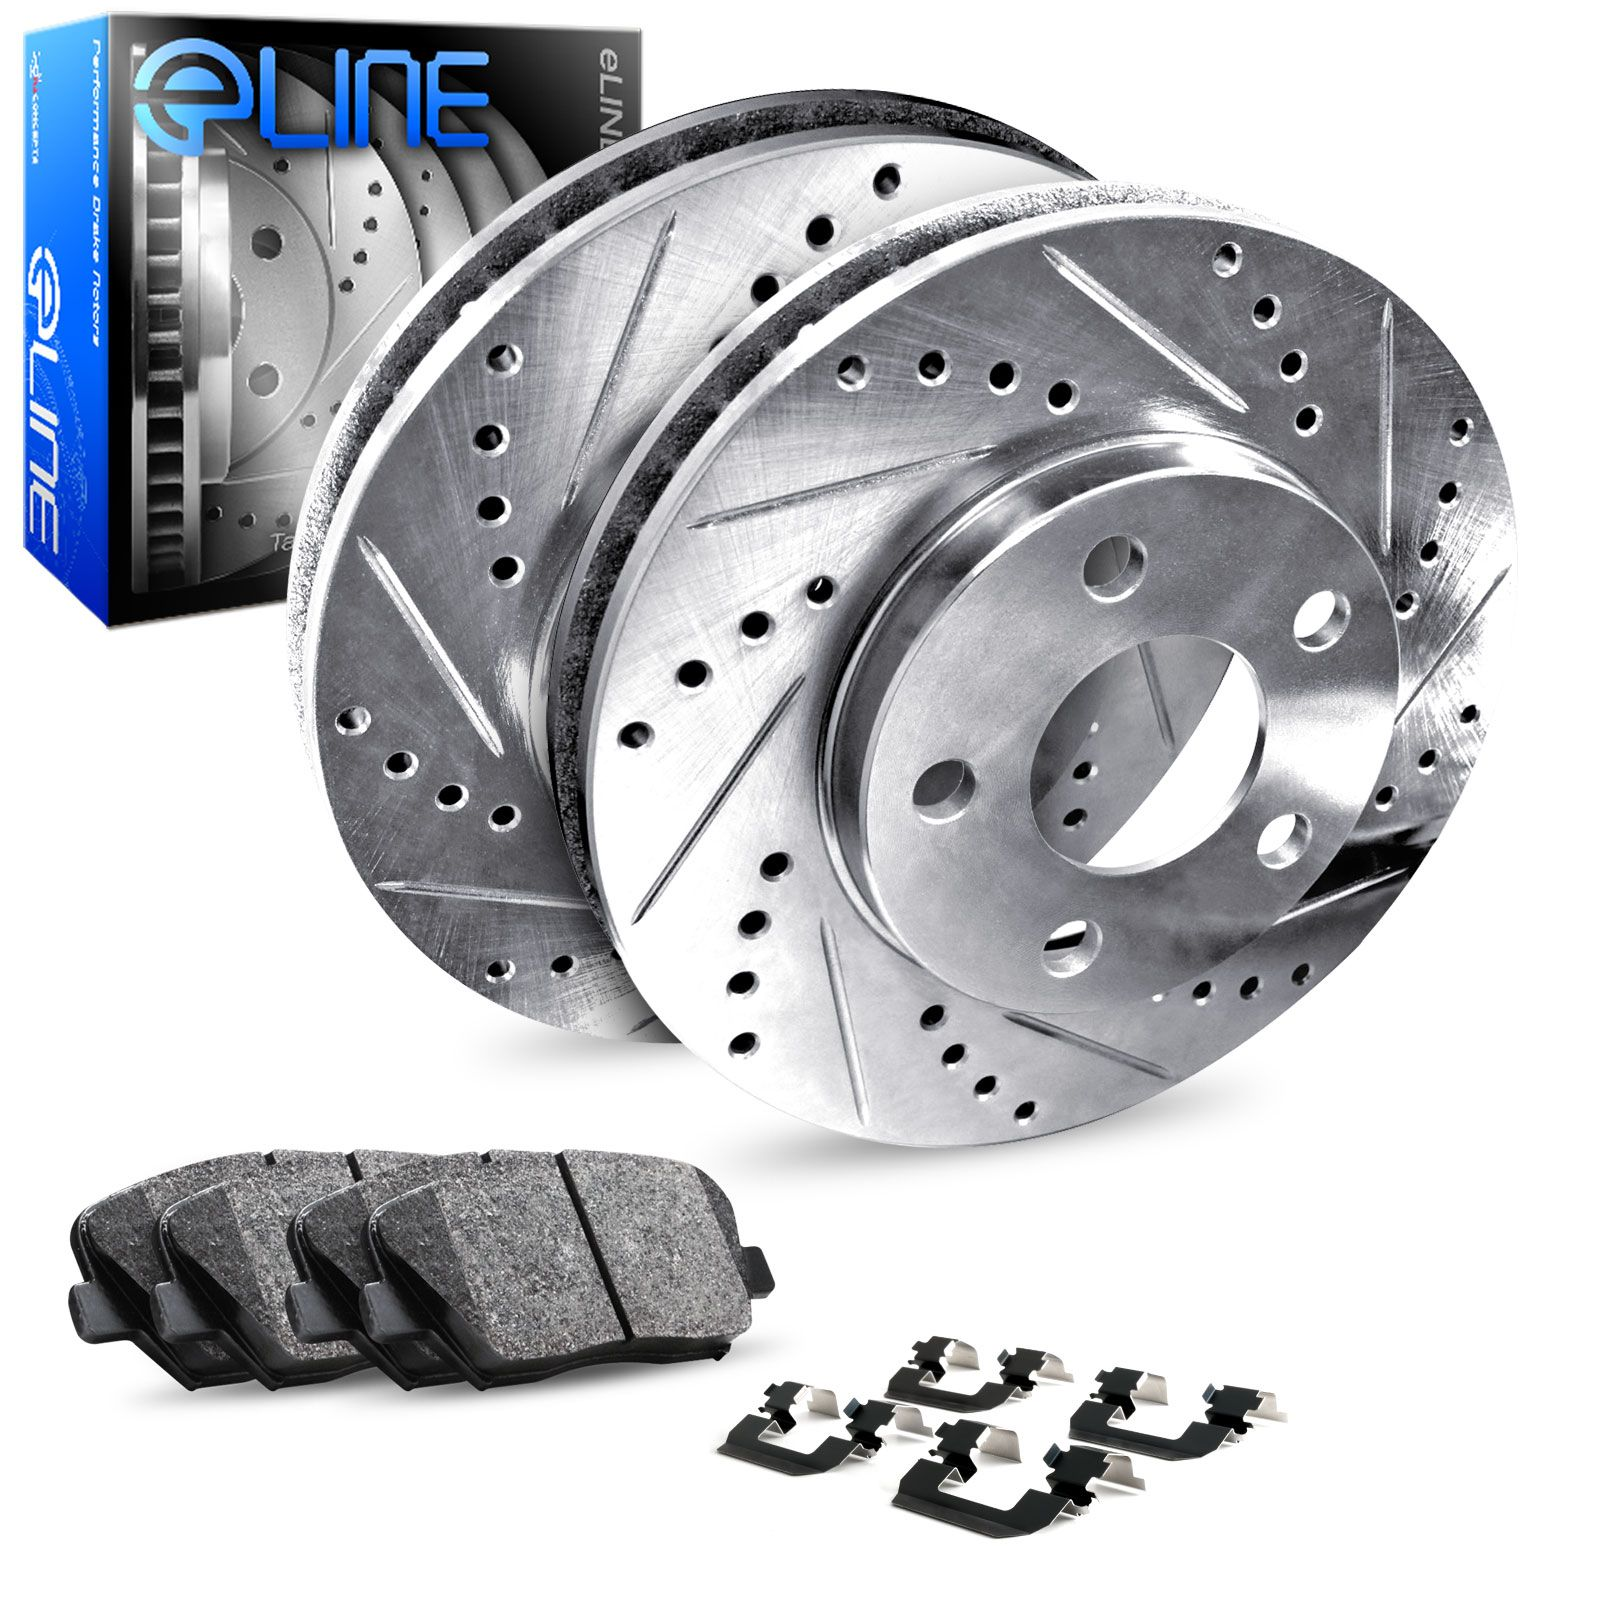 For Taurus Continental Sable Rear Drill Slot Brake Rotors And Ceramic Pads